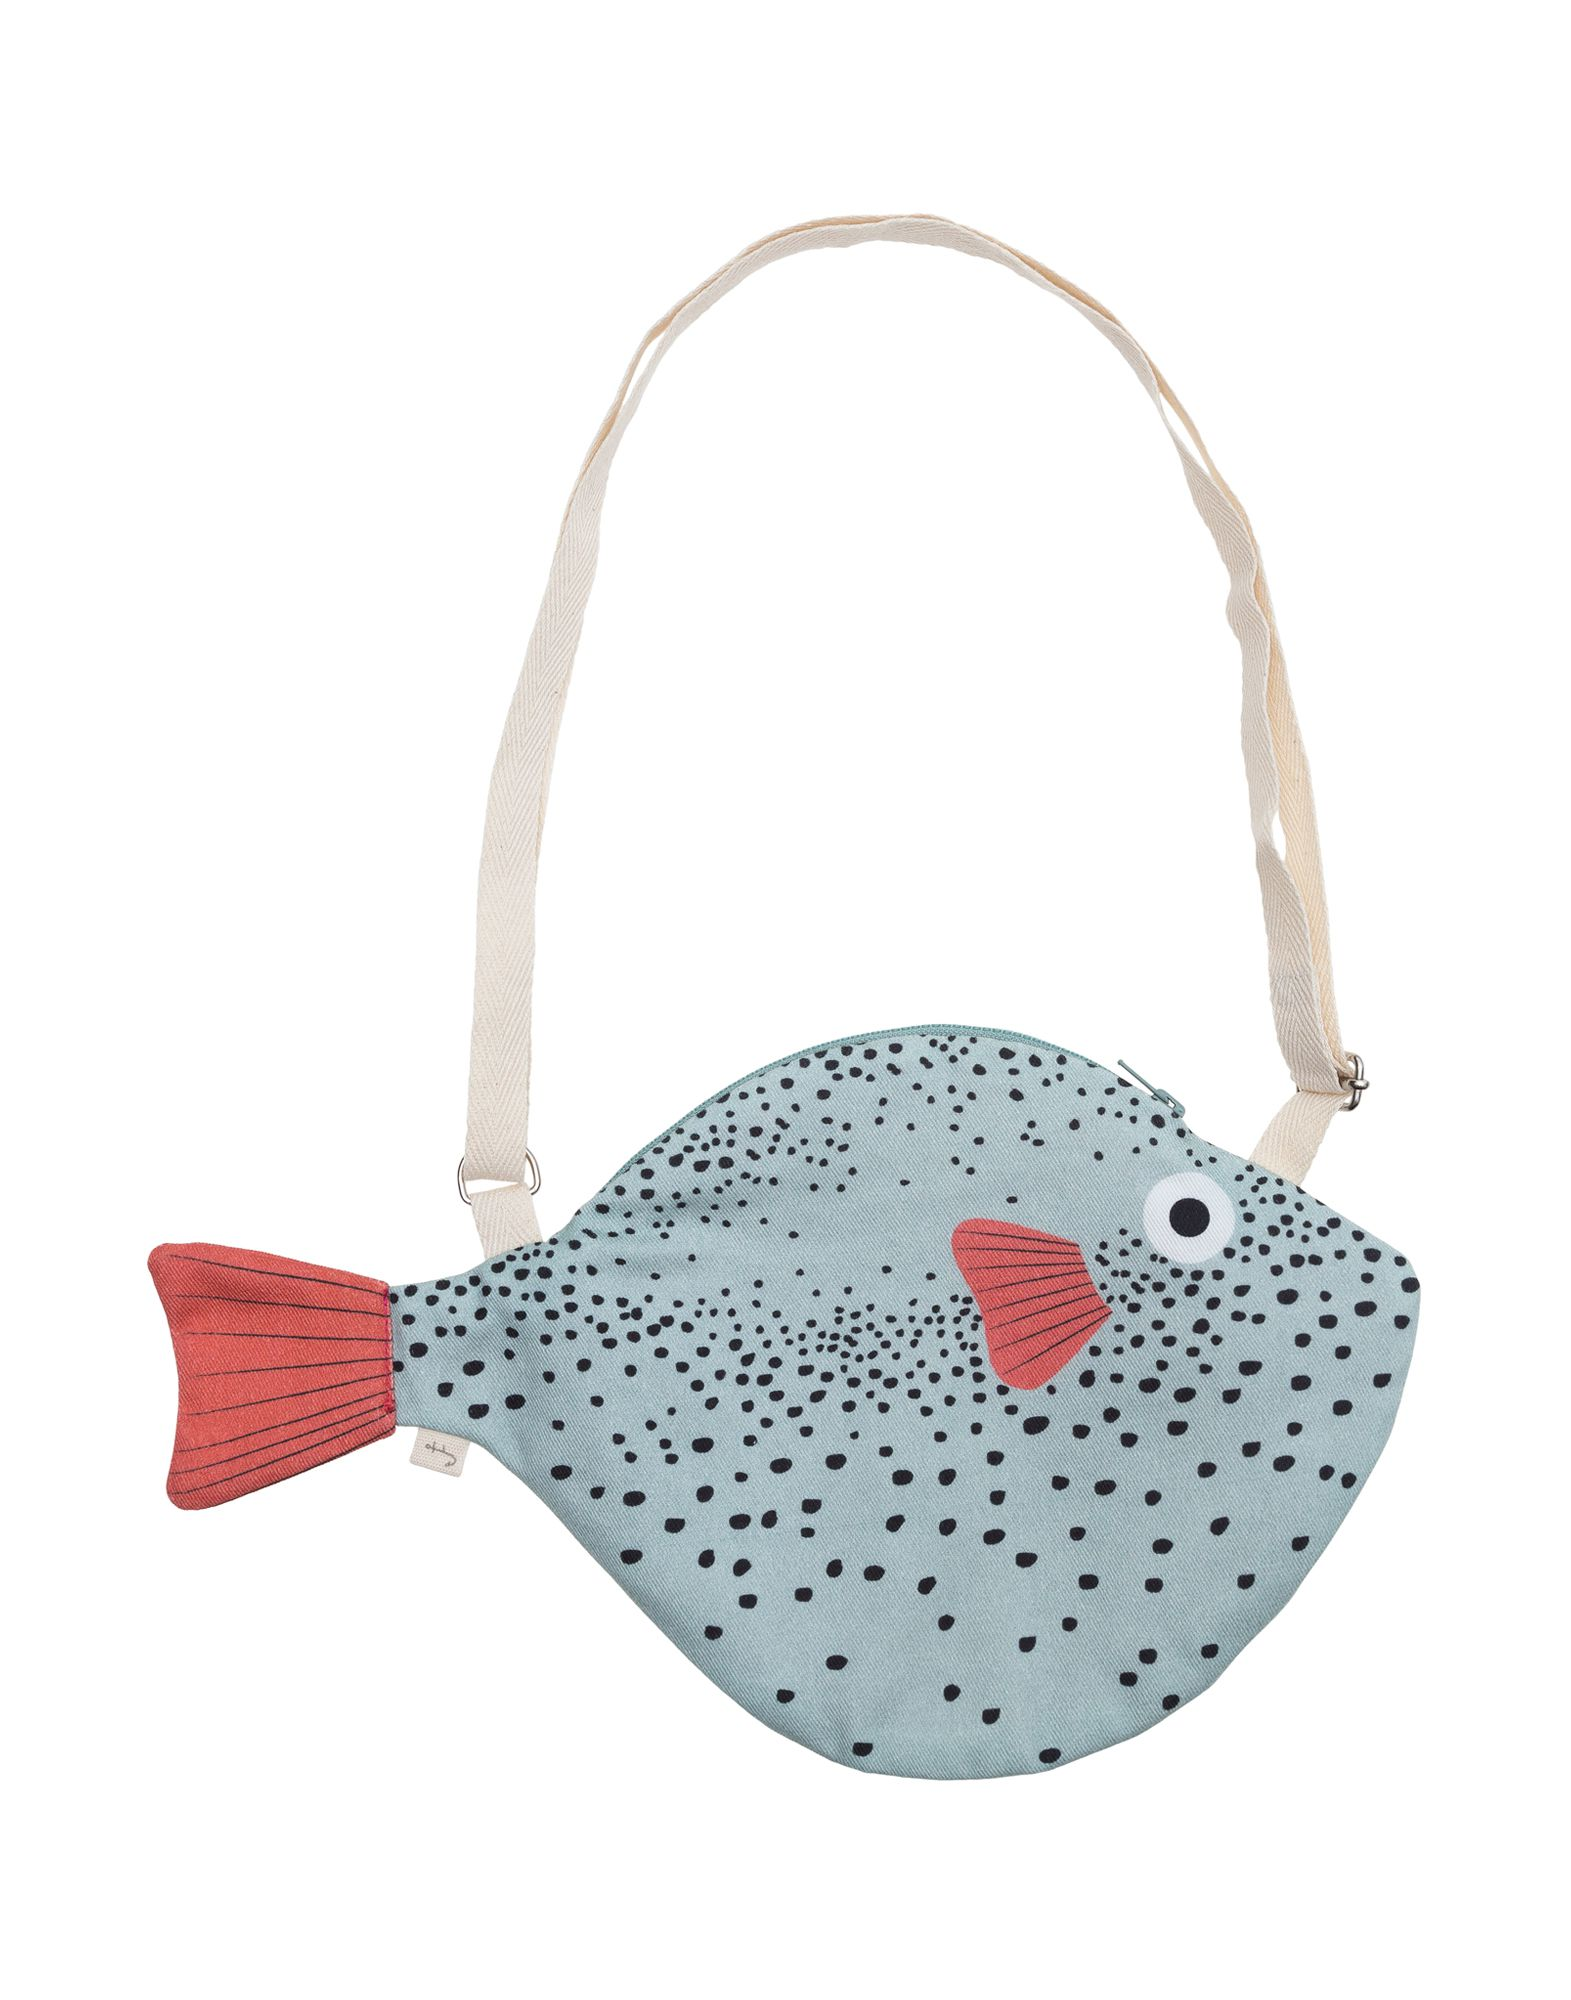 DON FISHER Сумка через плечо сумка через плечо anais gvani croco ag 1471 350161